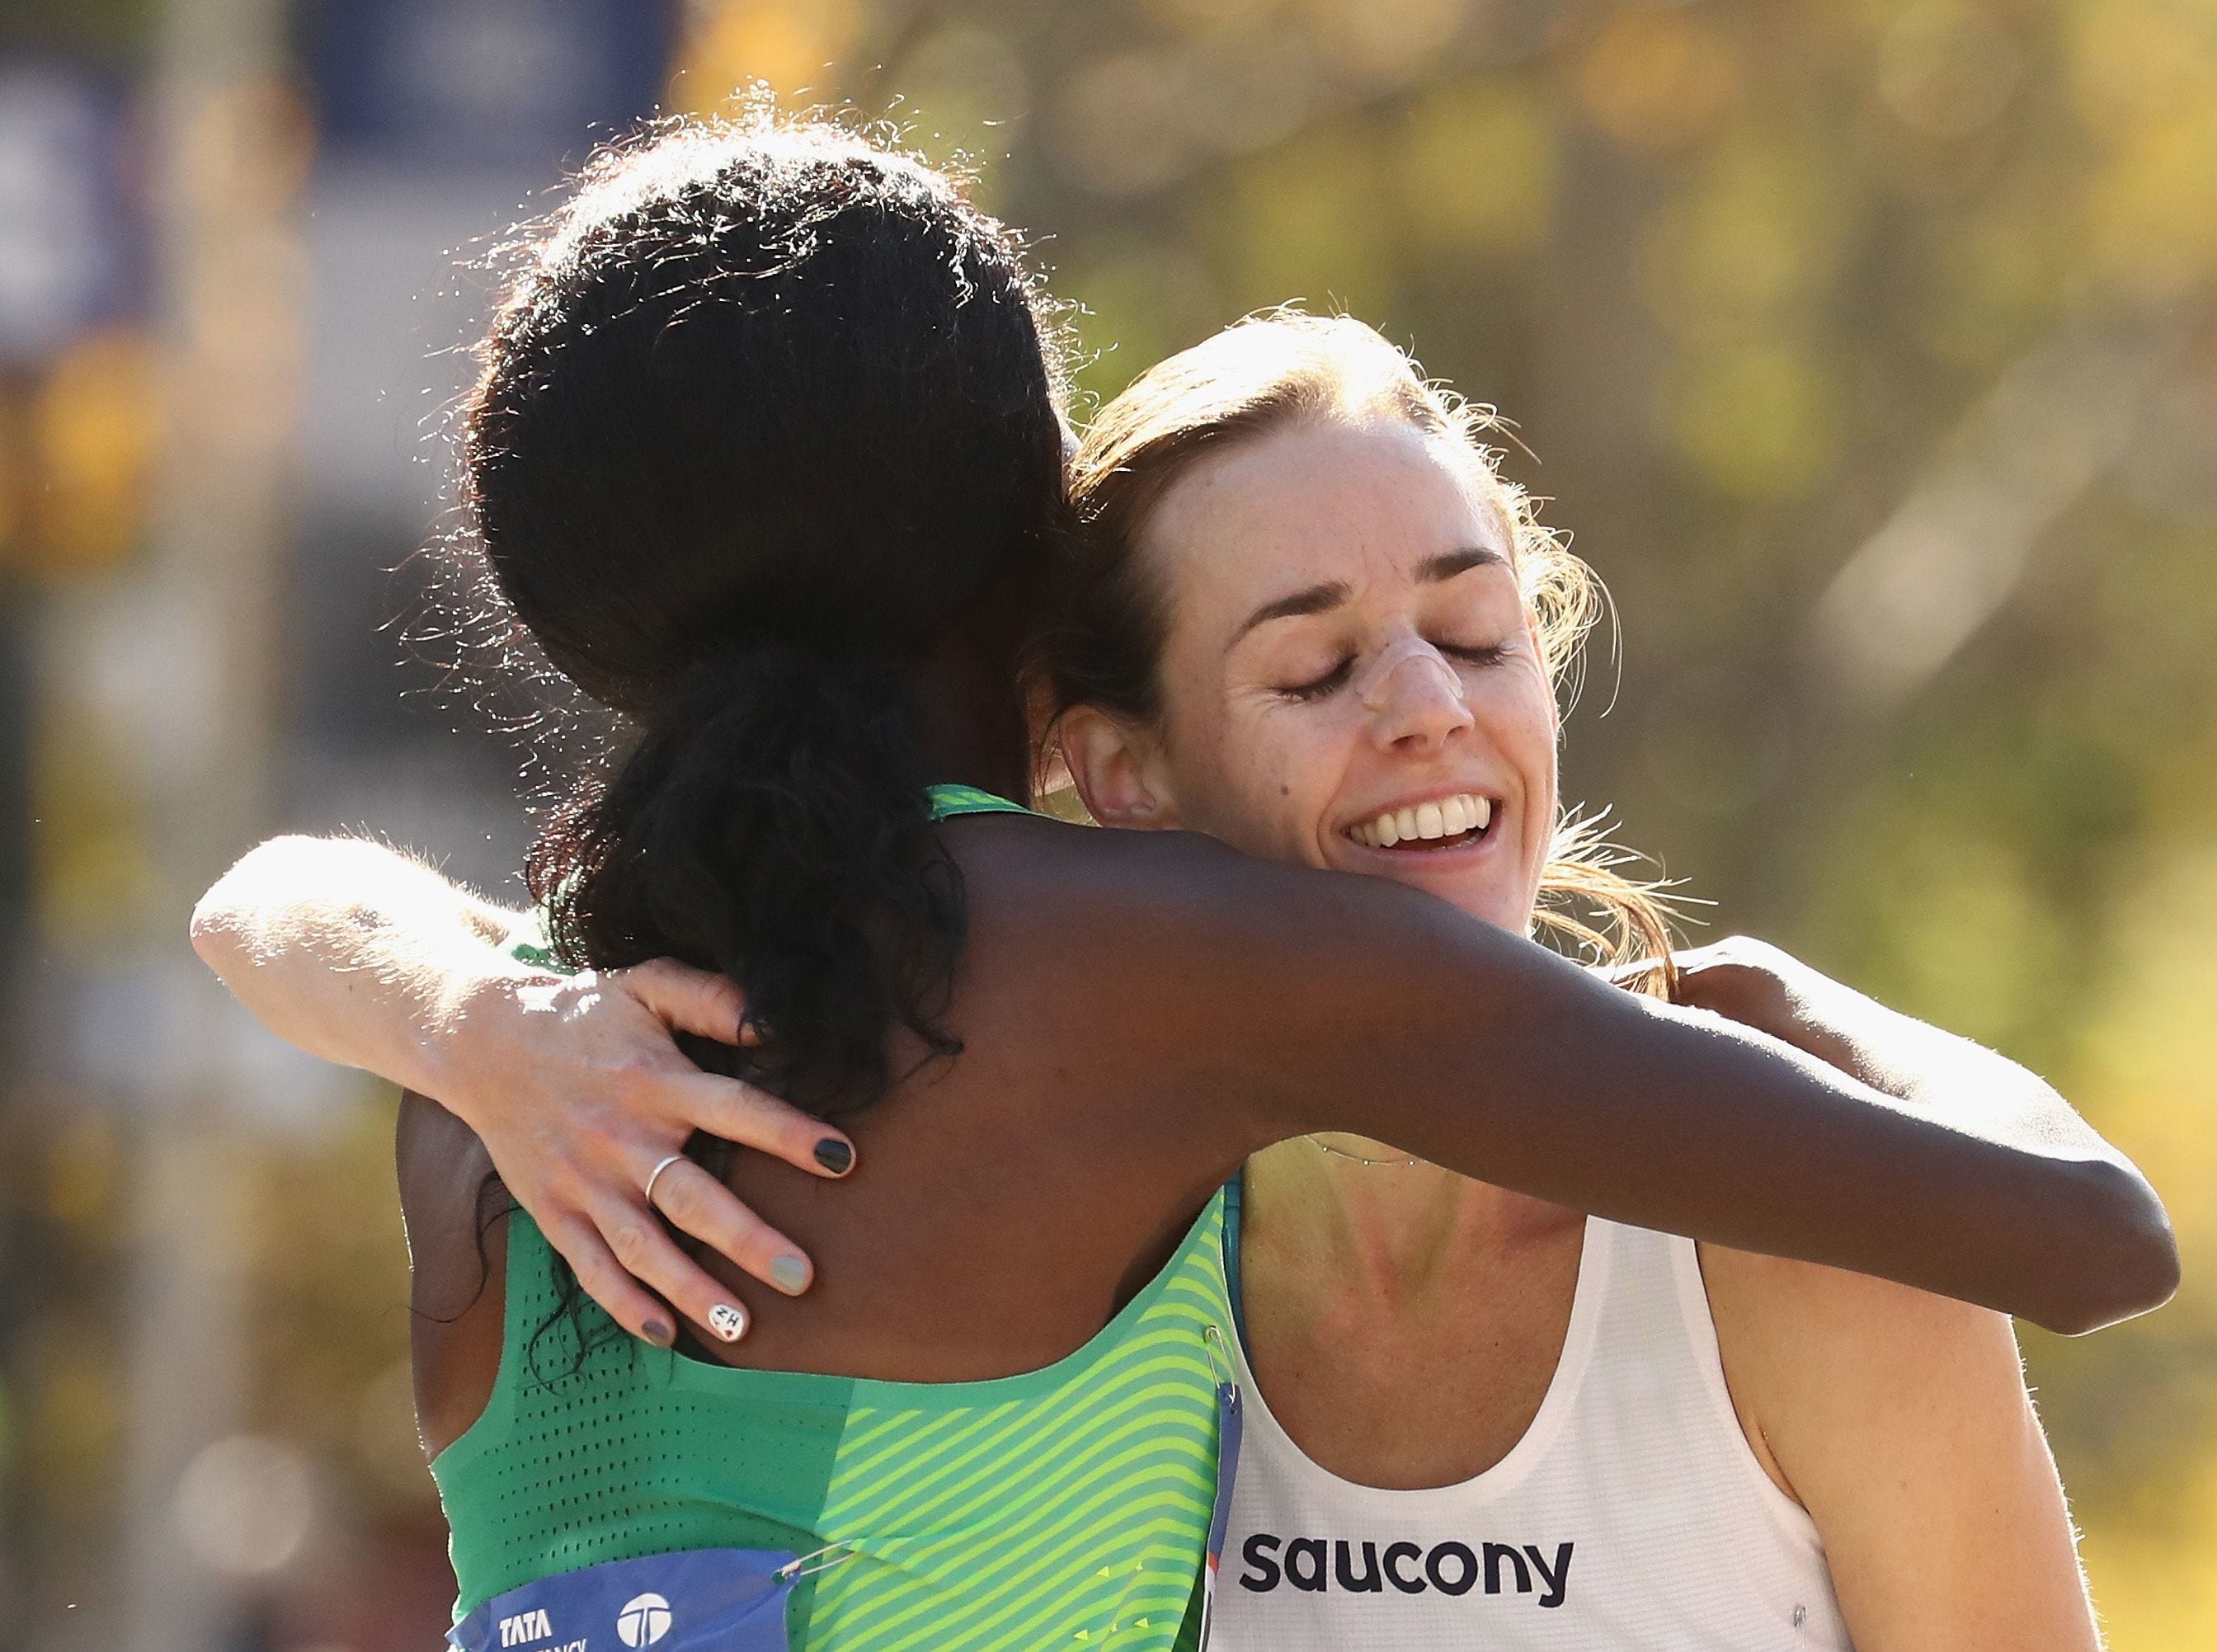 Sally Kipyego of Kenya and Molly Huddle embrace after 2016 New York City Marathon. Huddle is a native of Elmira, NY.